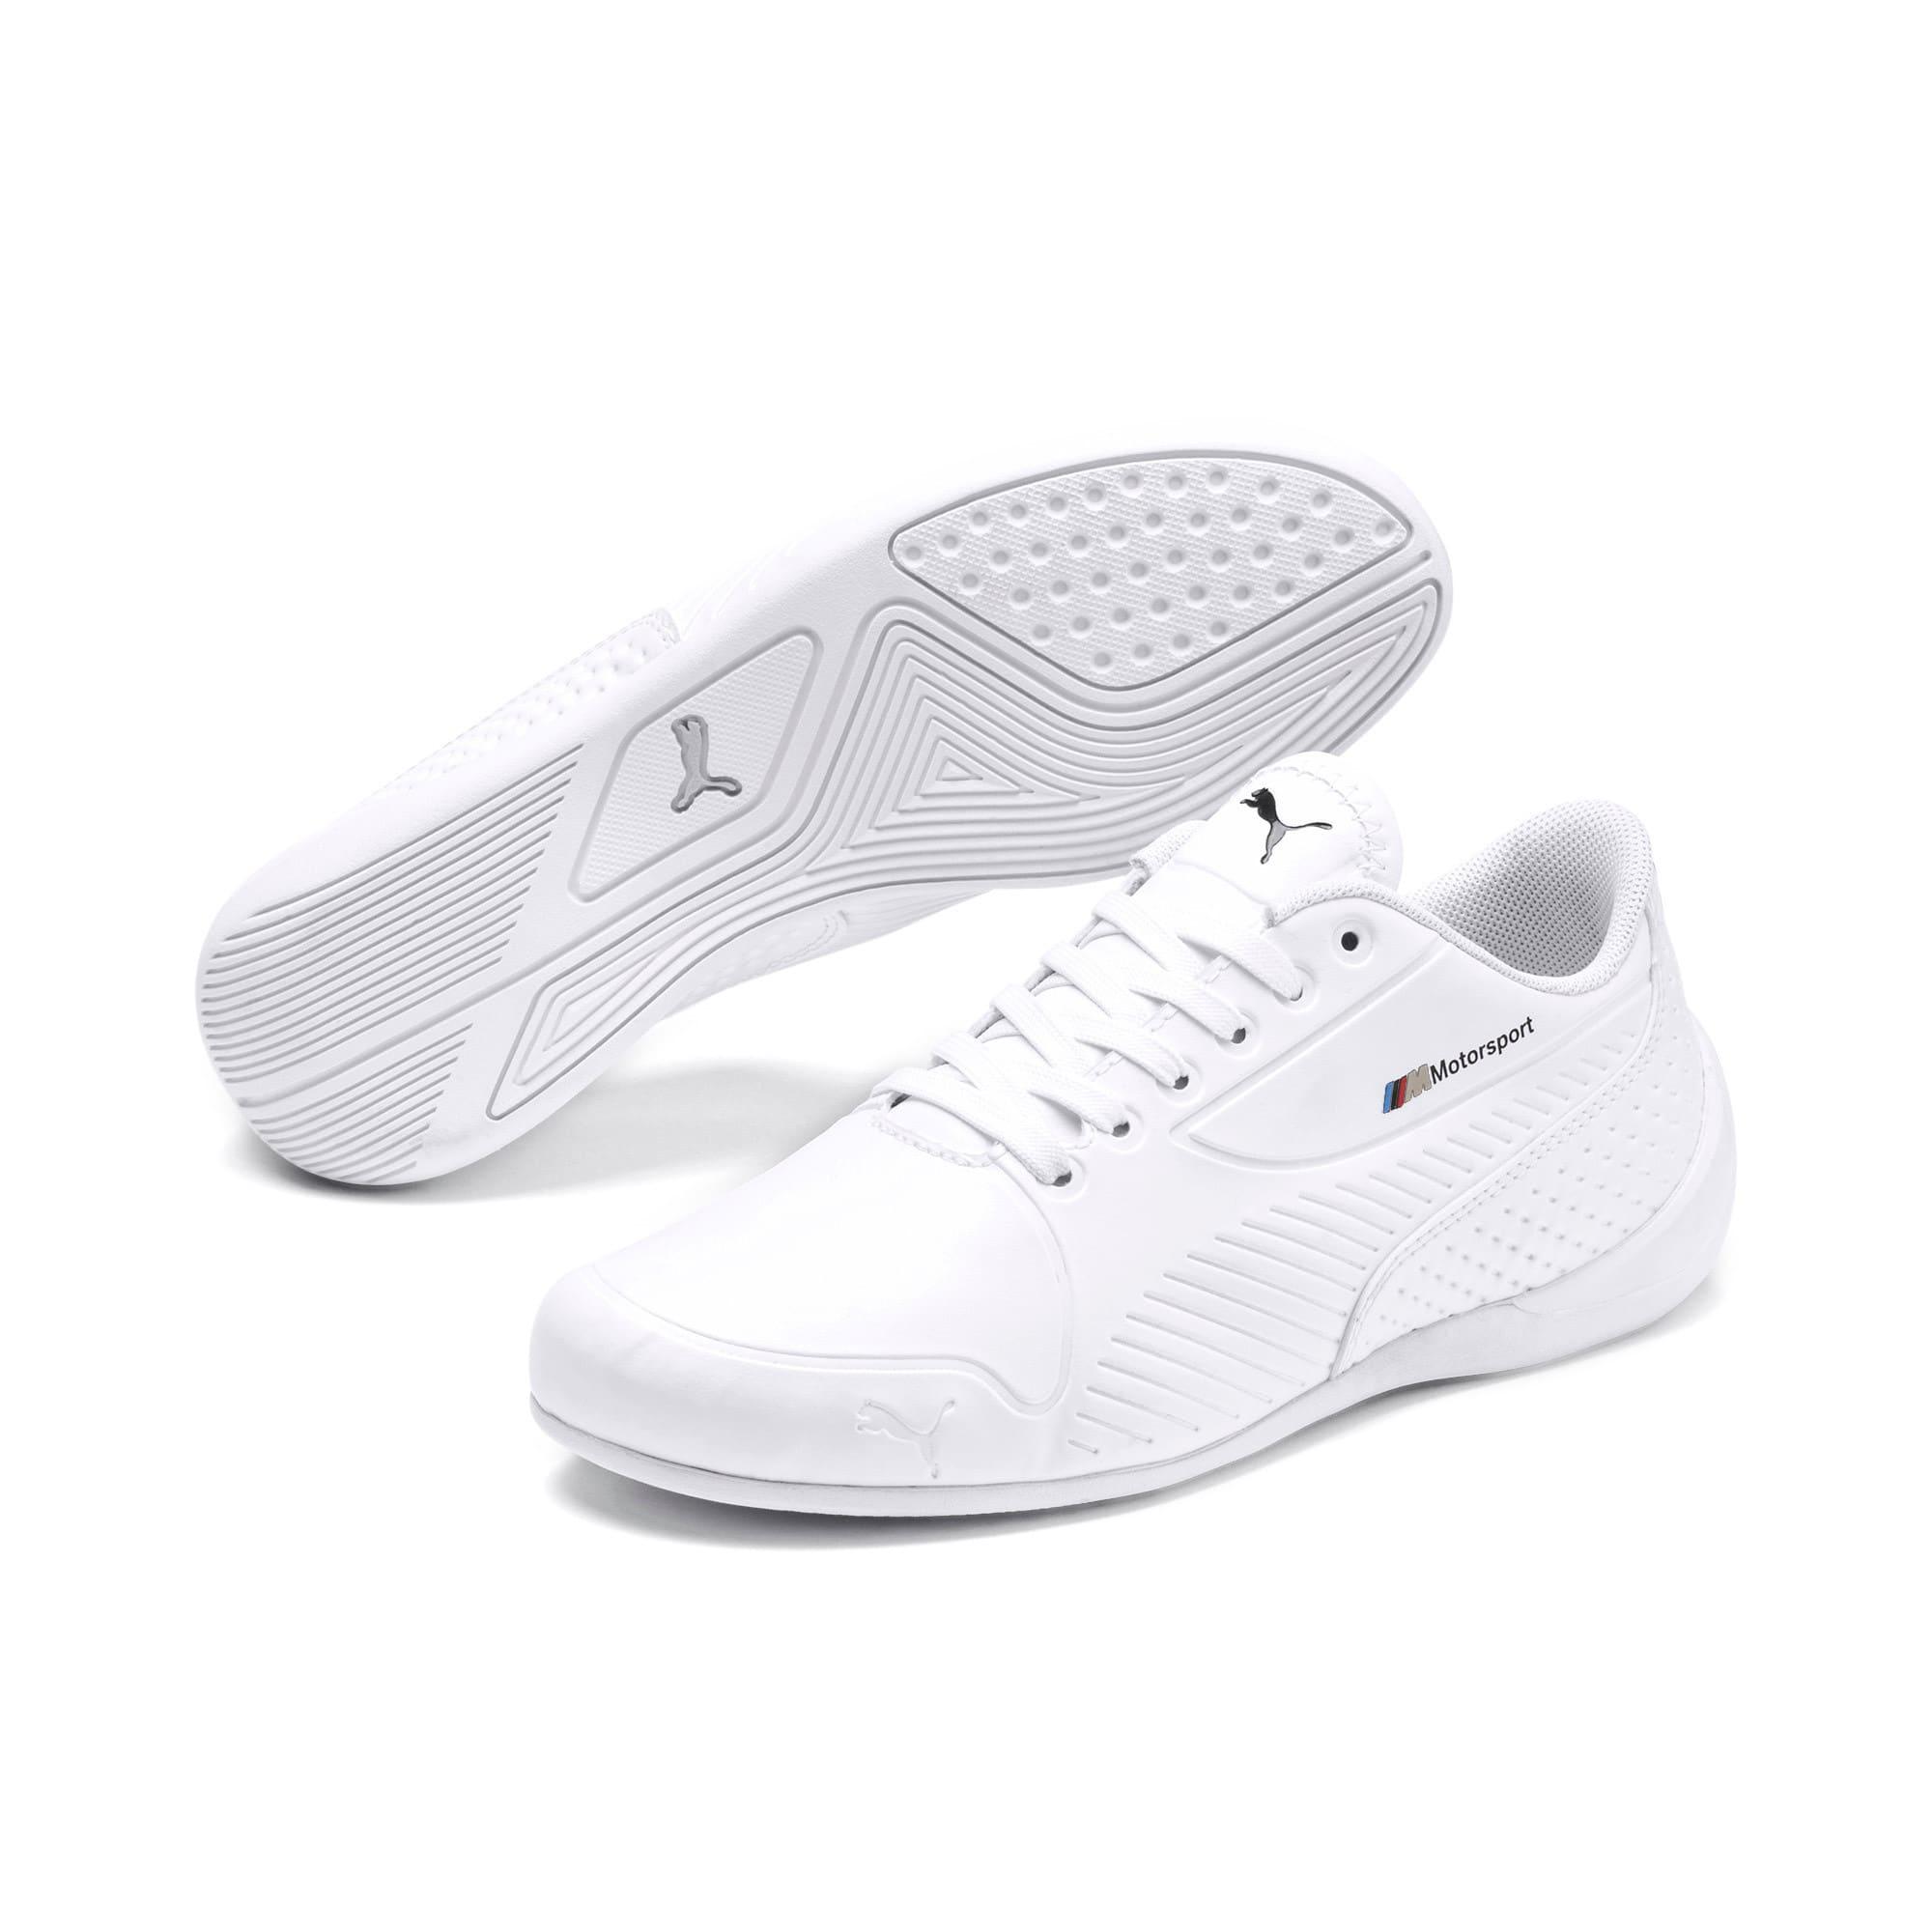 Thumbnail 2 of BMW M Motorsport Drift Cat 7S Ultra Youth sneakers, Puma White-Puma White, medium